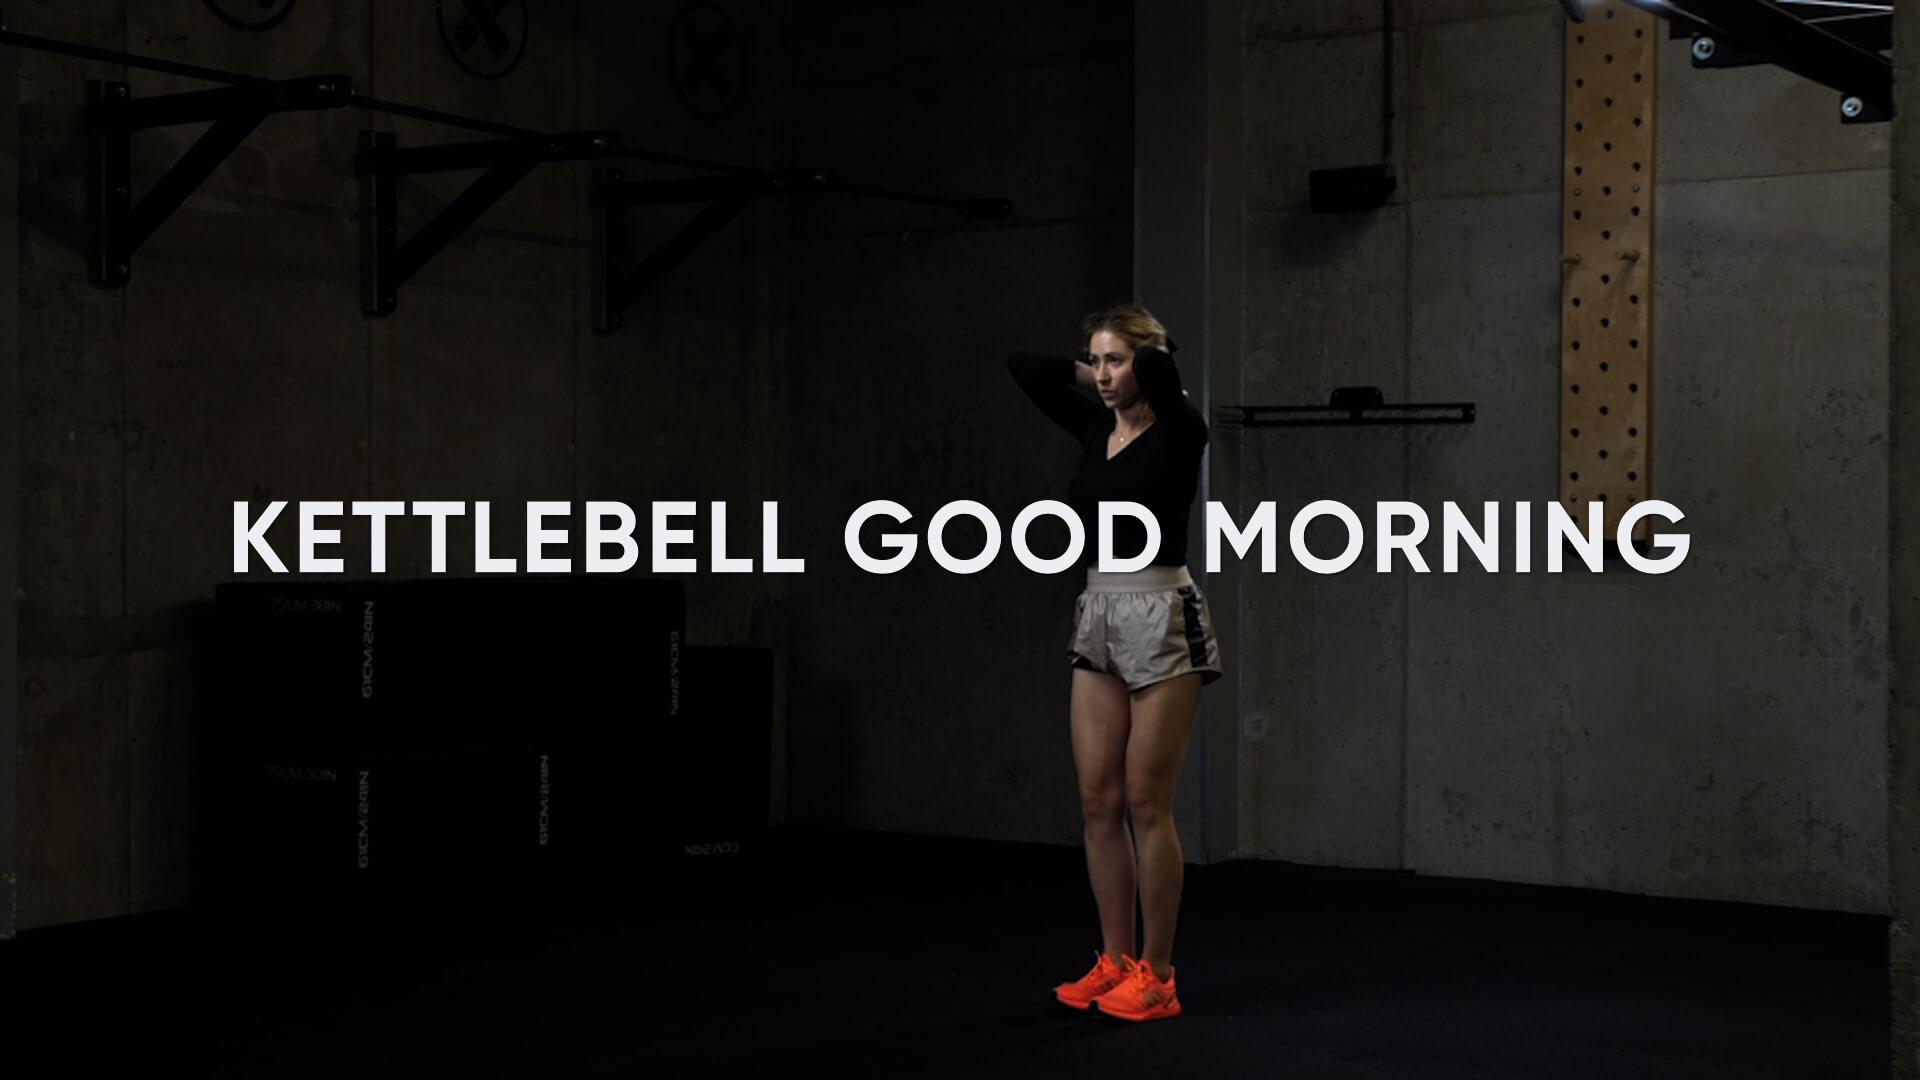 Kettlebell Good Morning